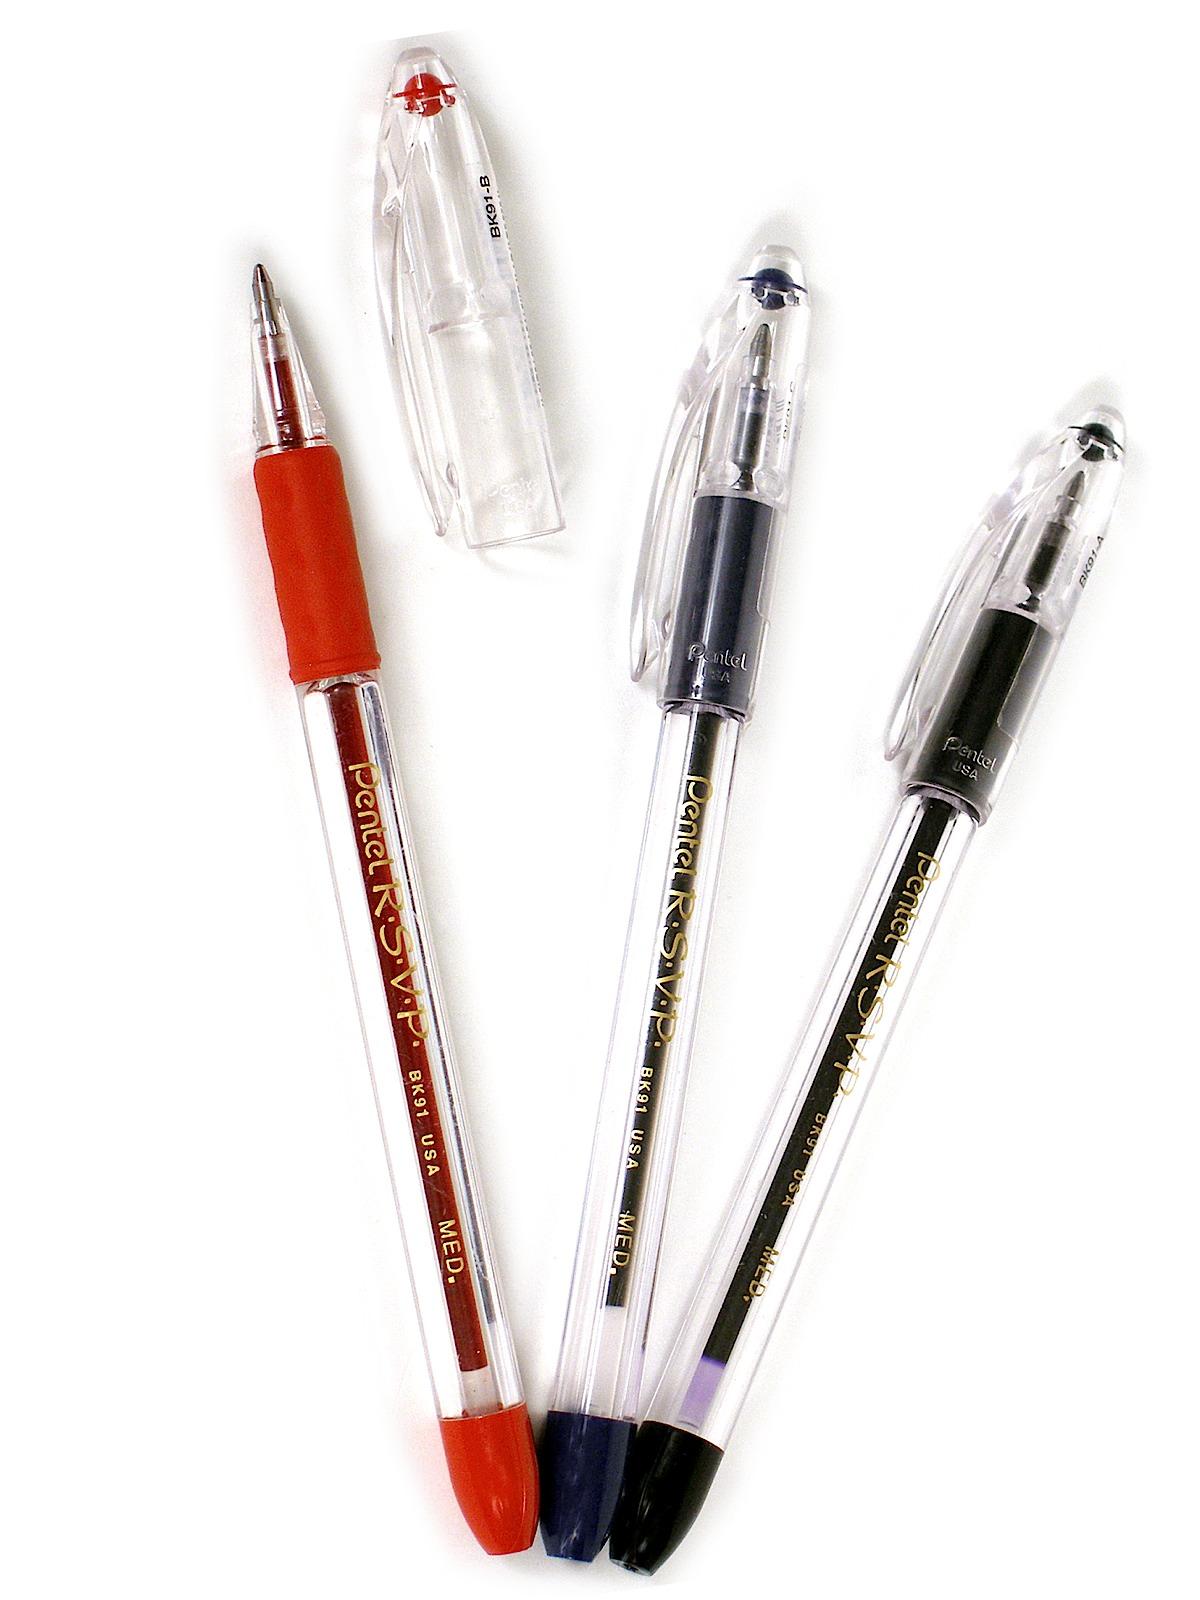 RSVP Ballpoint Pens